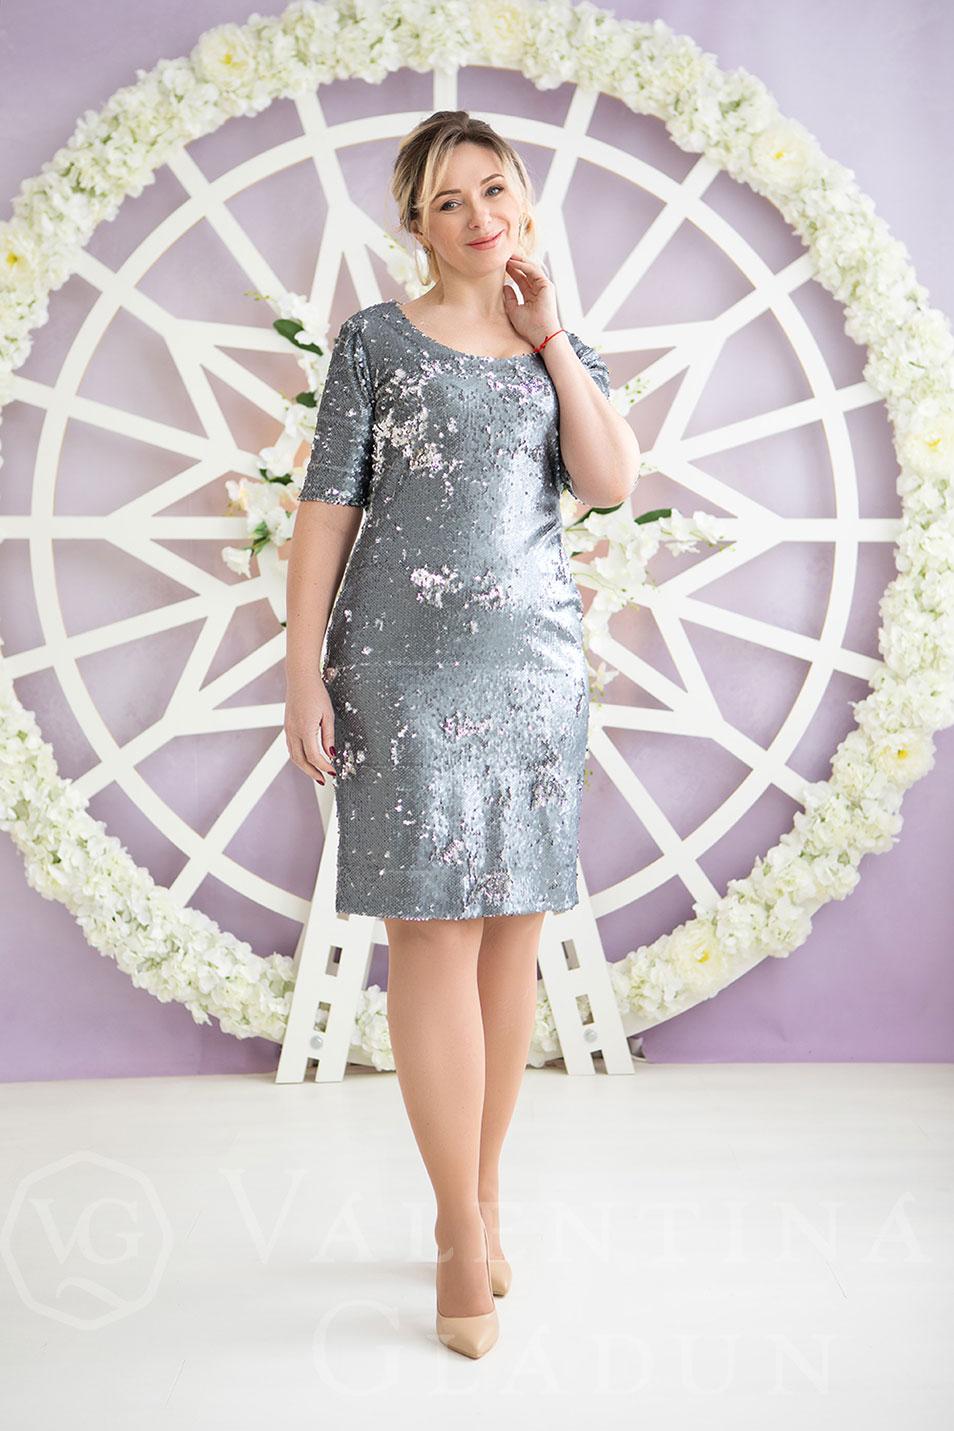 1a94c30e035 Вечернее серое платье с пайетками на корпоратив Tina  цена